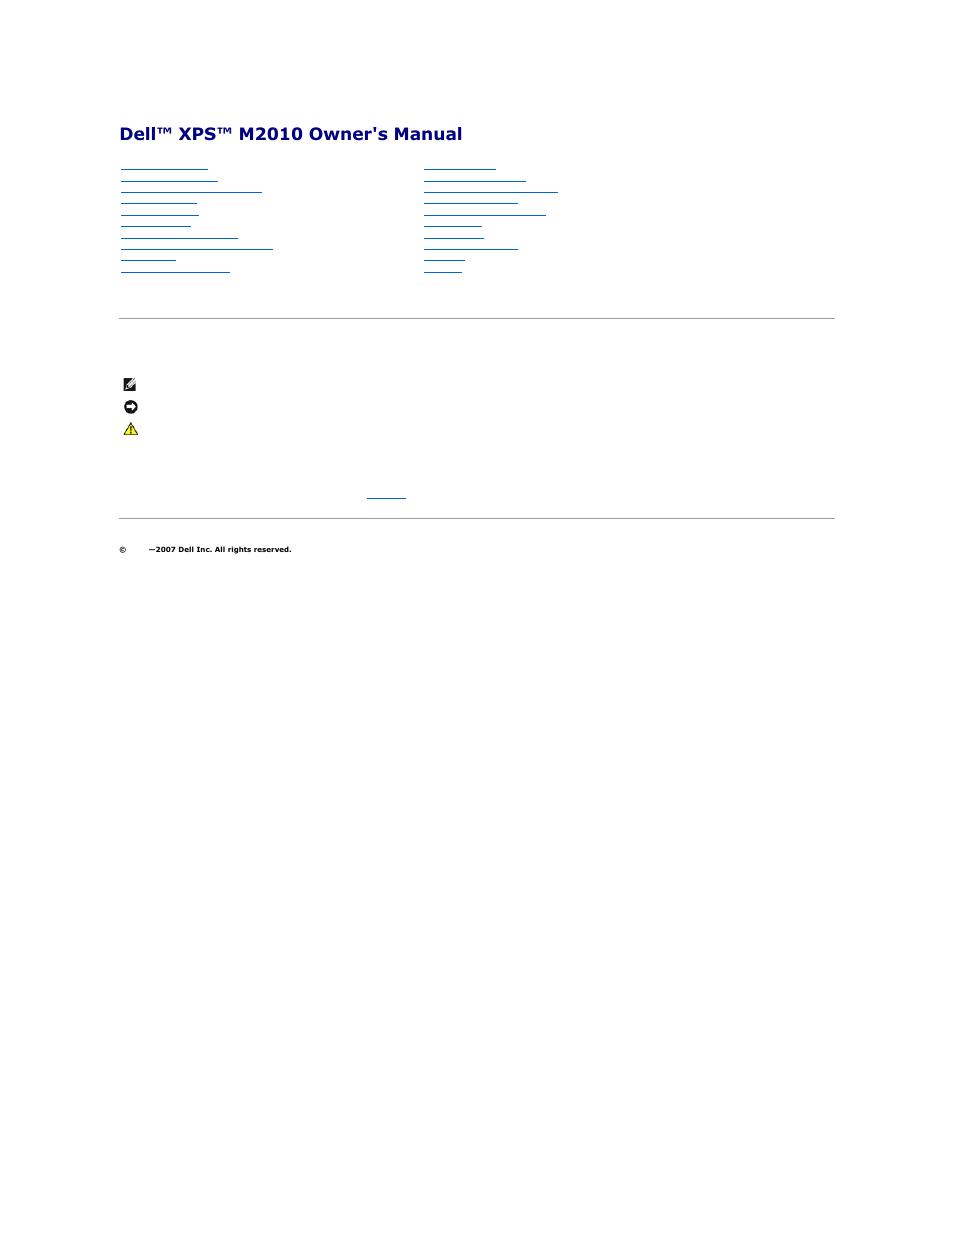 dell xps m2010 mxp061 mid 2006 user manual 116 pages rh manualsdir com Dell XPS M2010 Keyboard Dell XPS L322X